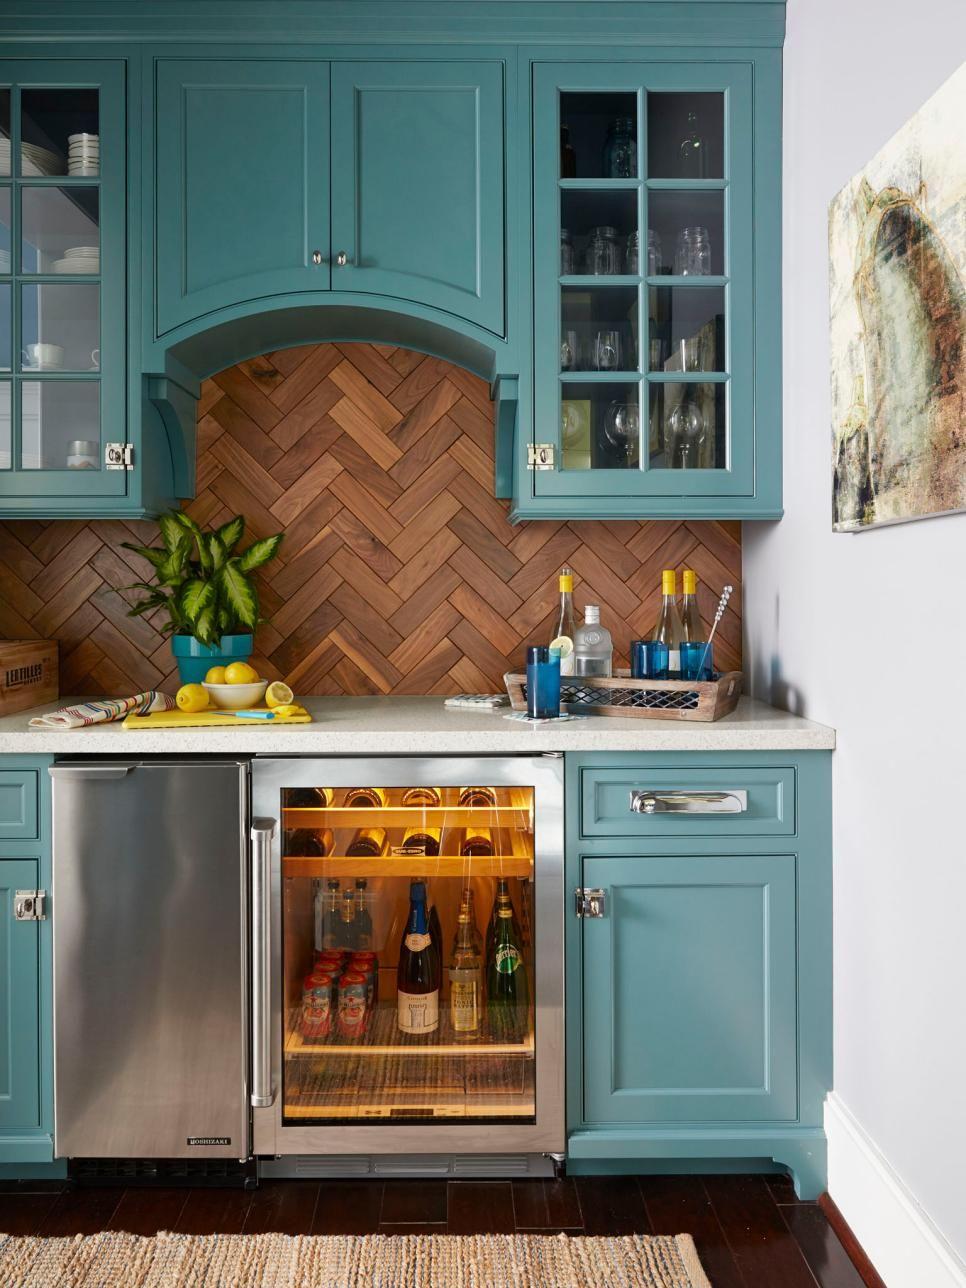 Love The Bold Kitchen Cabinet Paint Color And Backsplash